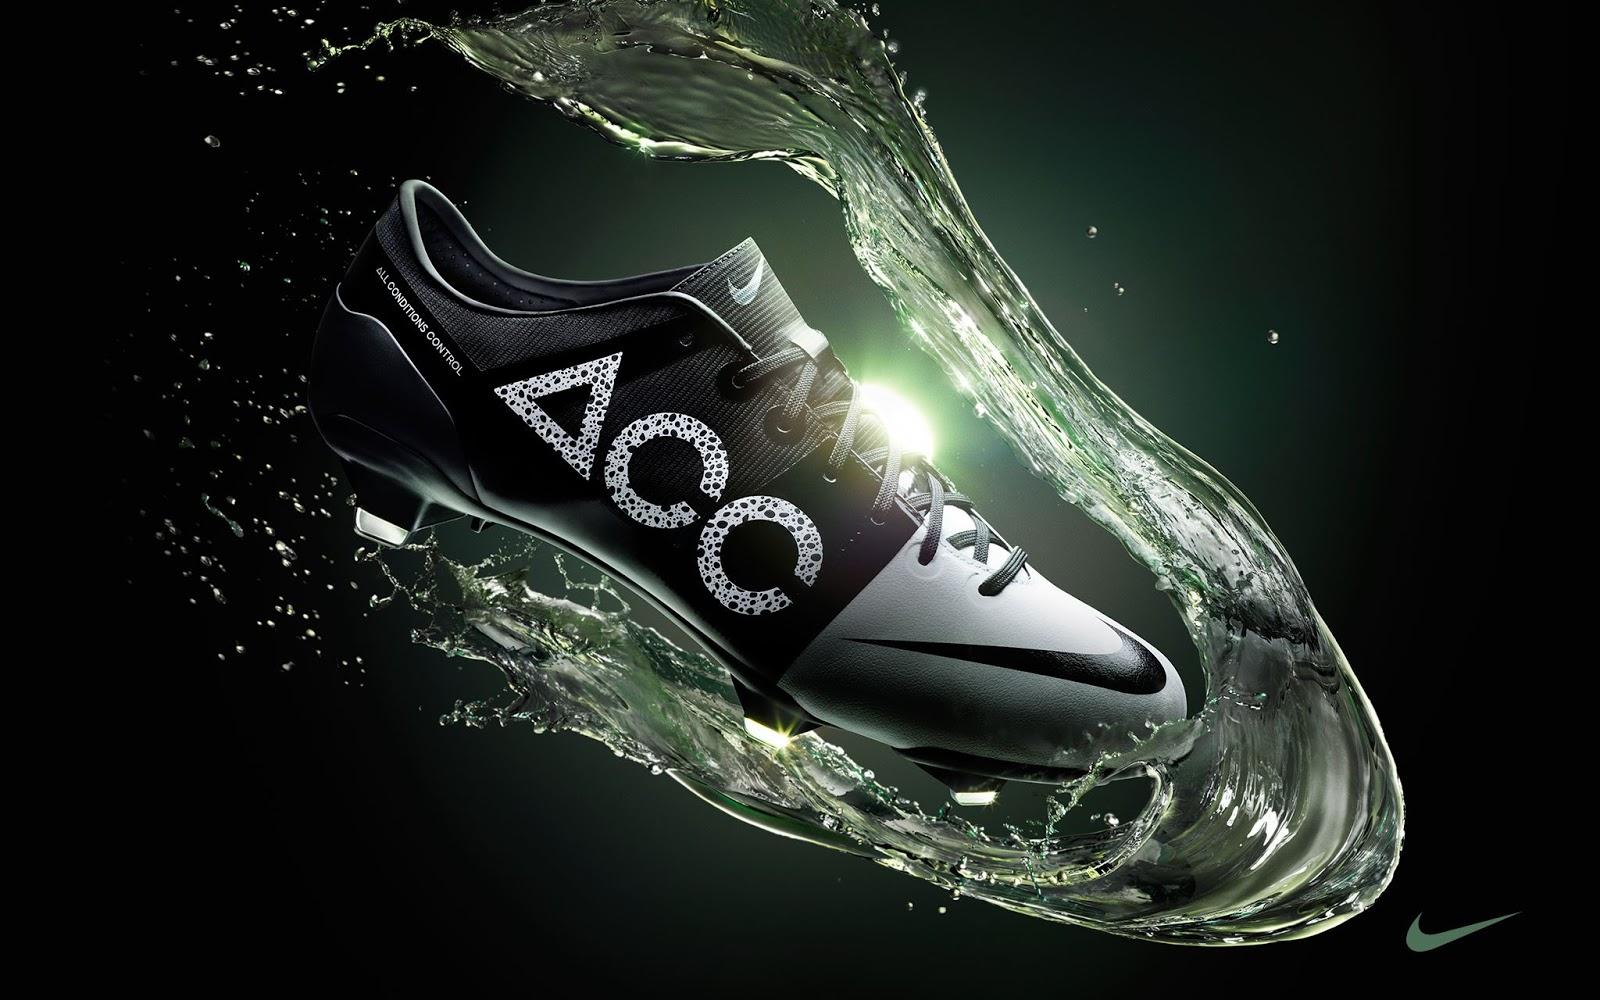 07863a3d88c6 En résumé chaussures de football